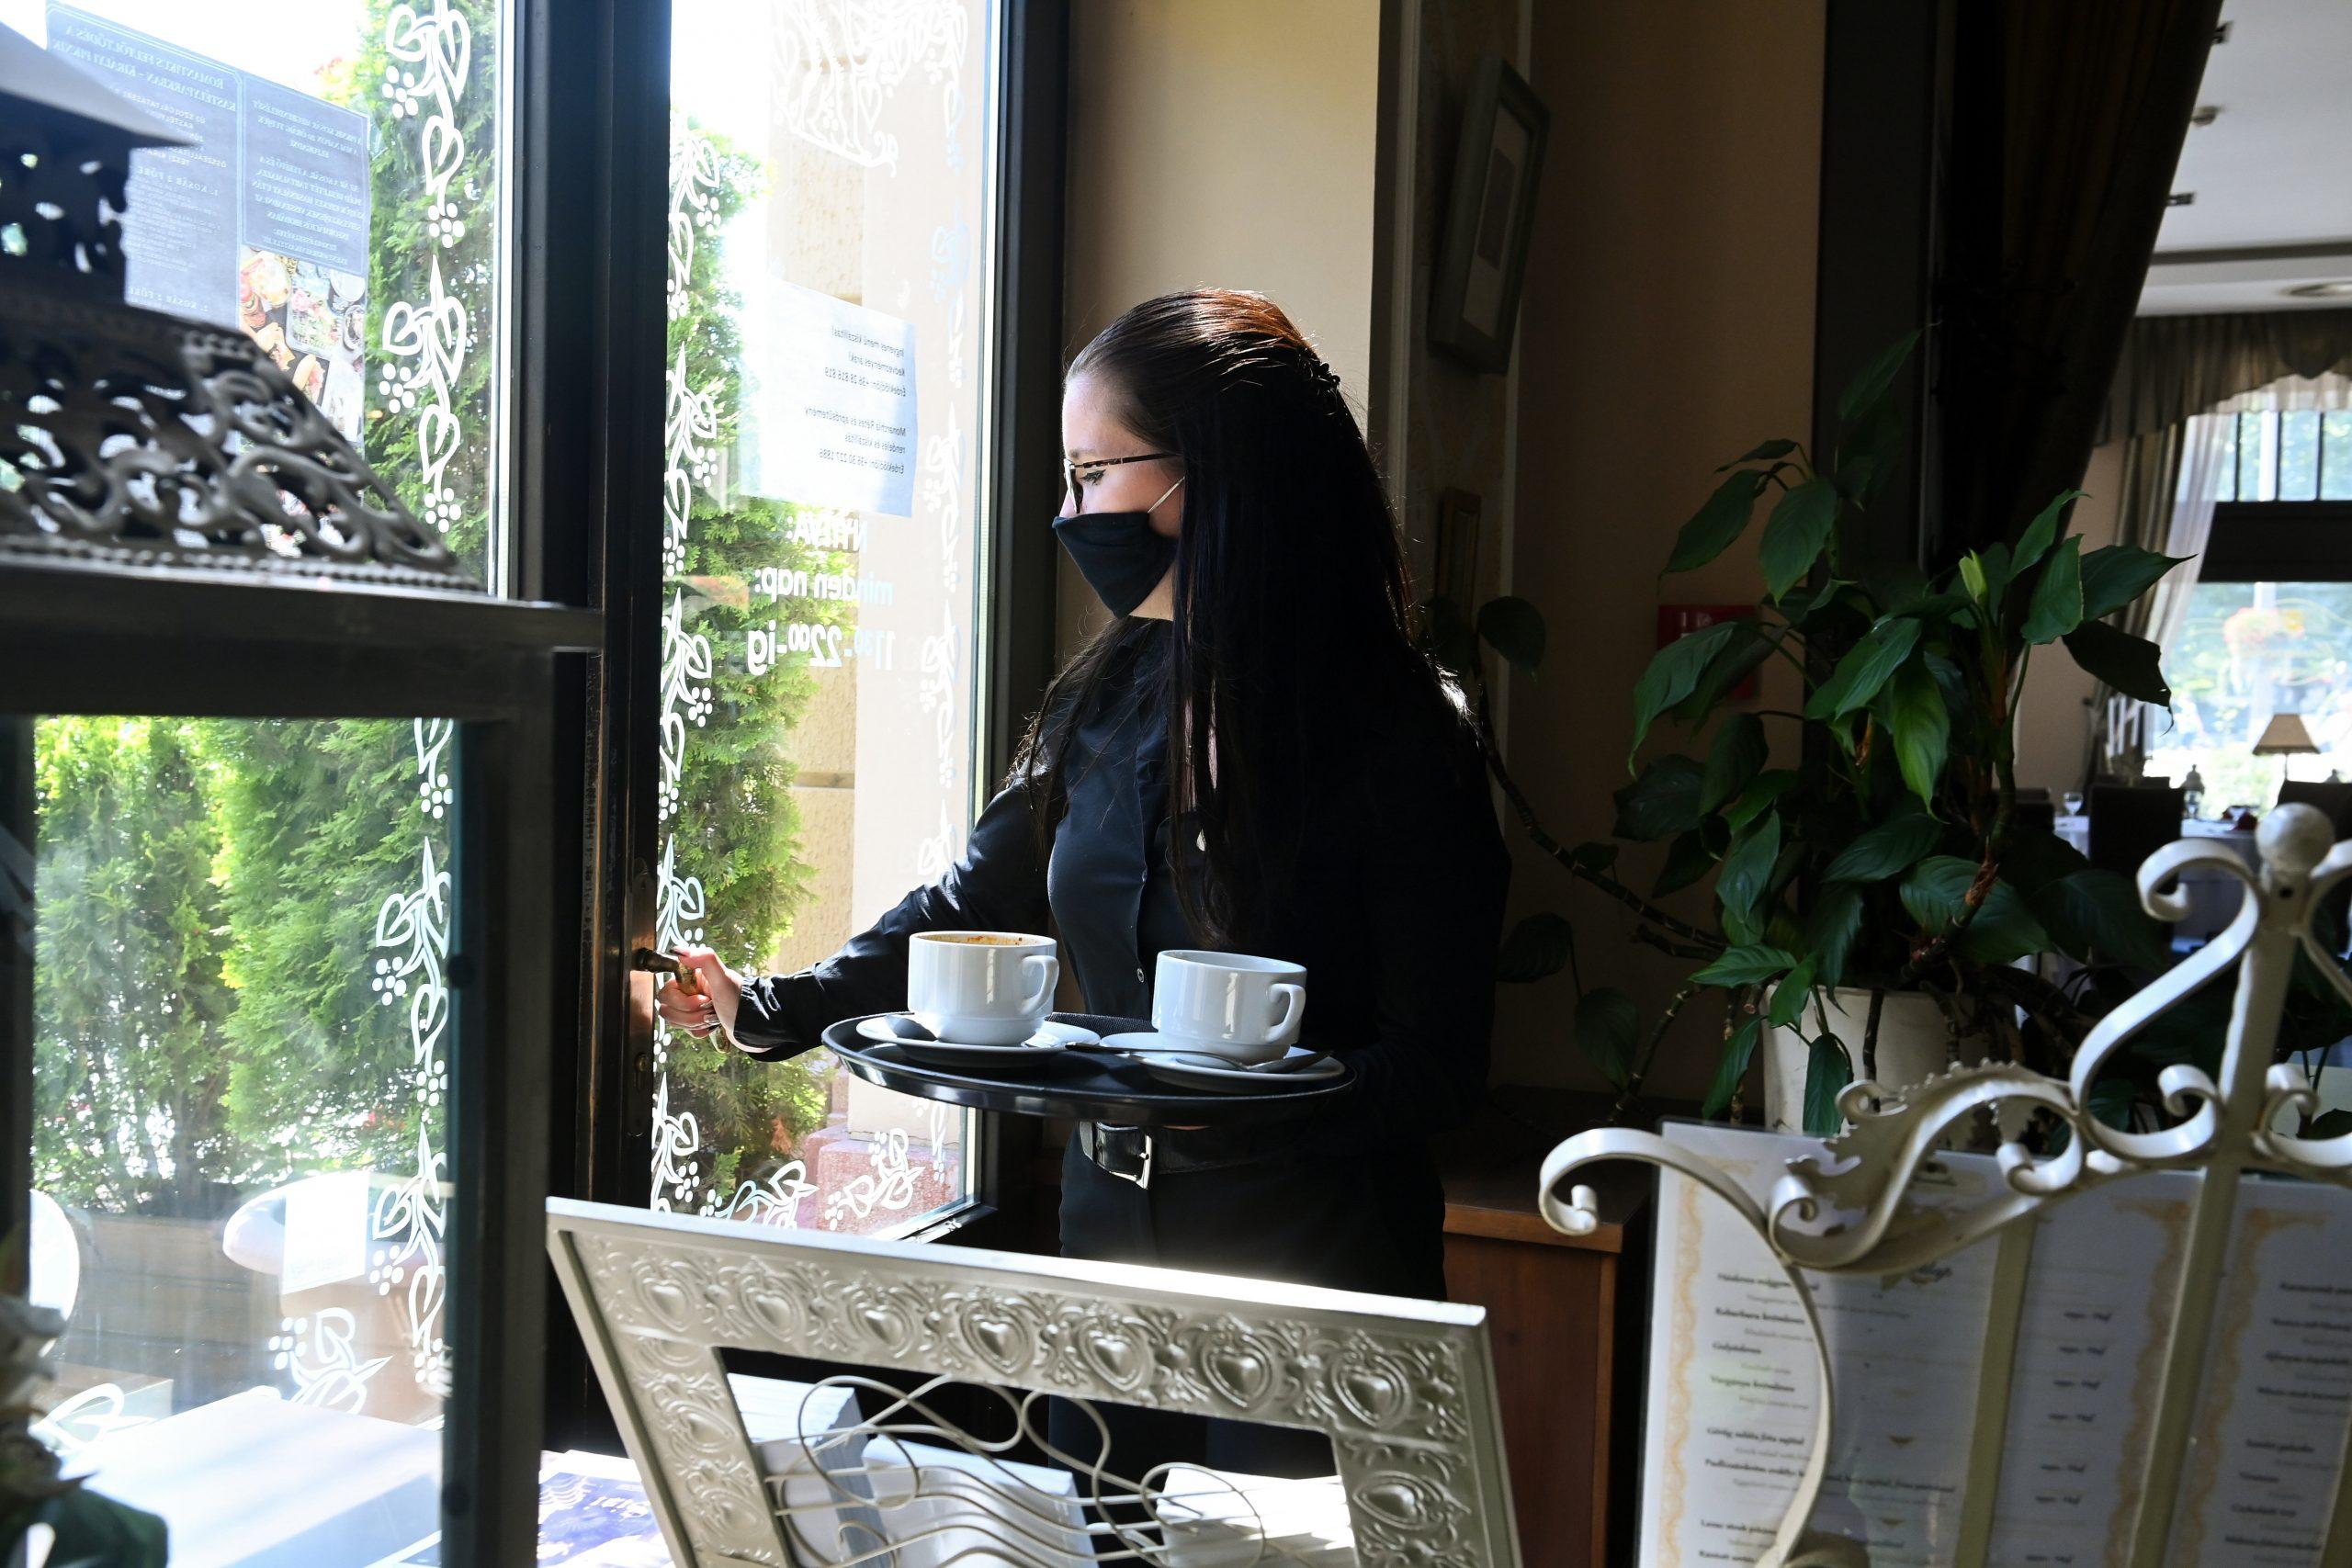 New Measures Introduced, Masks Mandatory in Restaurants